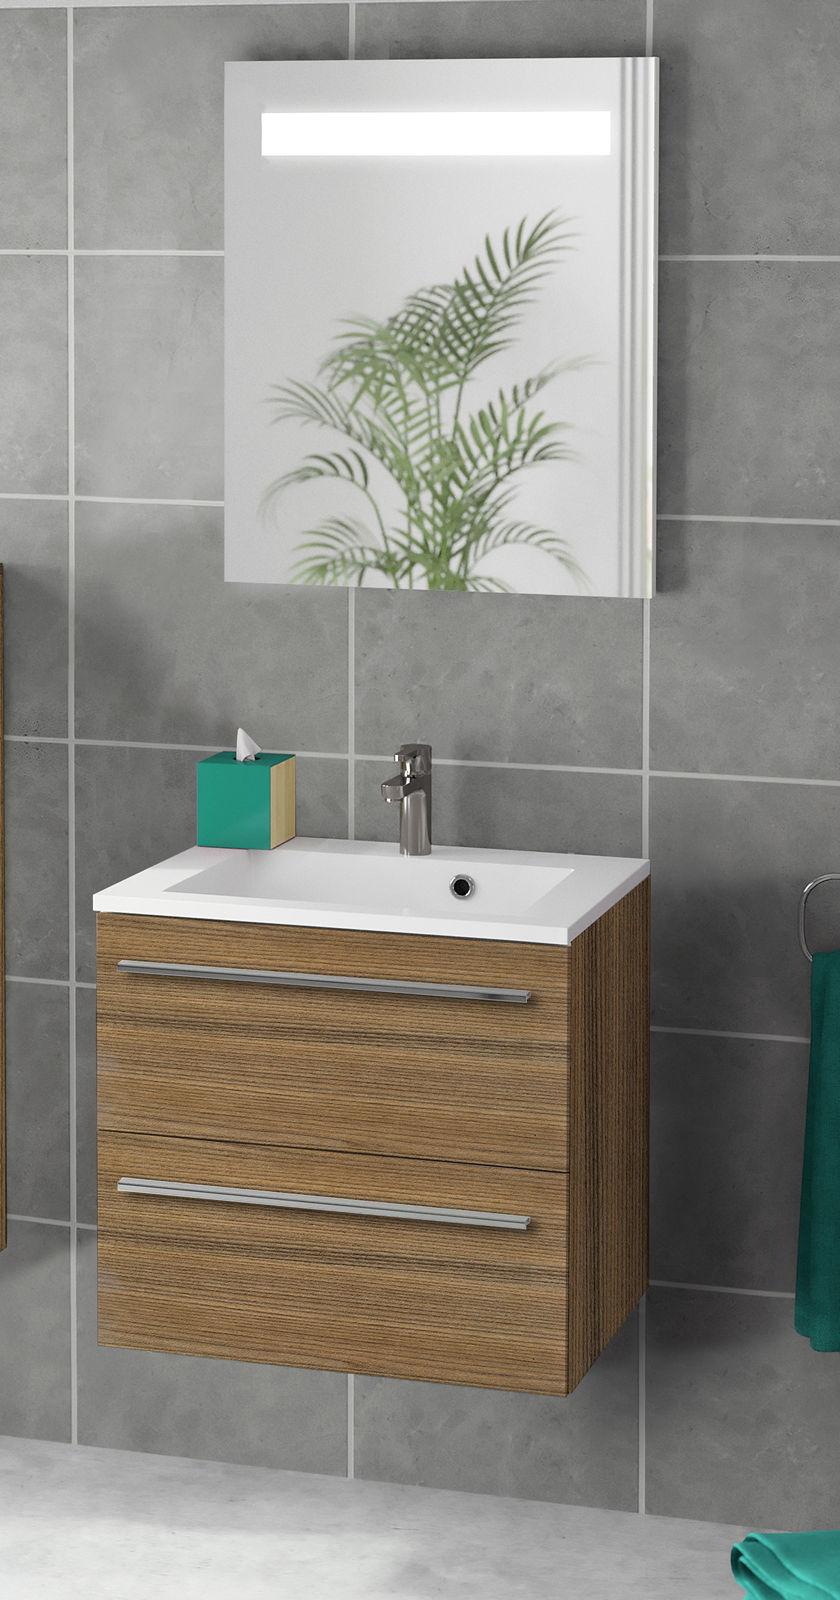 Meuble sous vasque 2 tiroirs 60 cm srie adesio 3 for Meuble sous vasque 60 cm